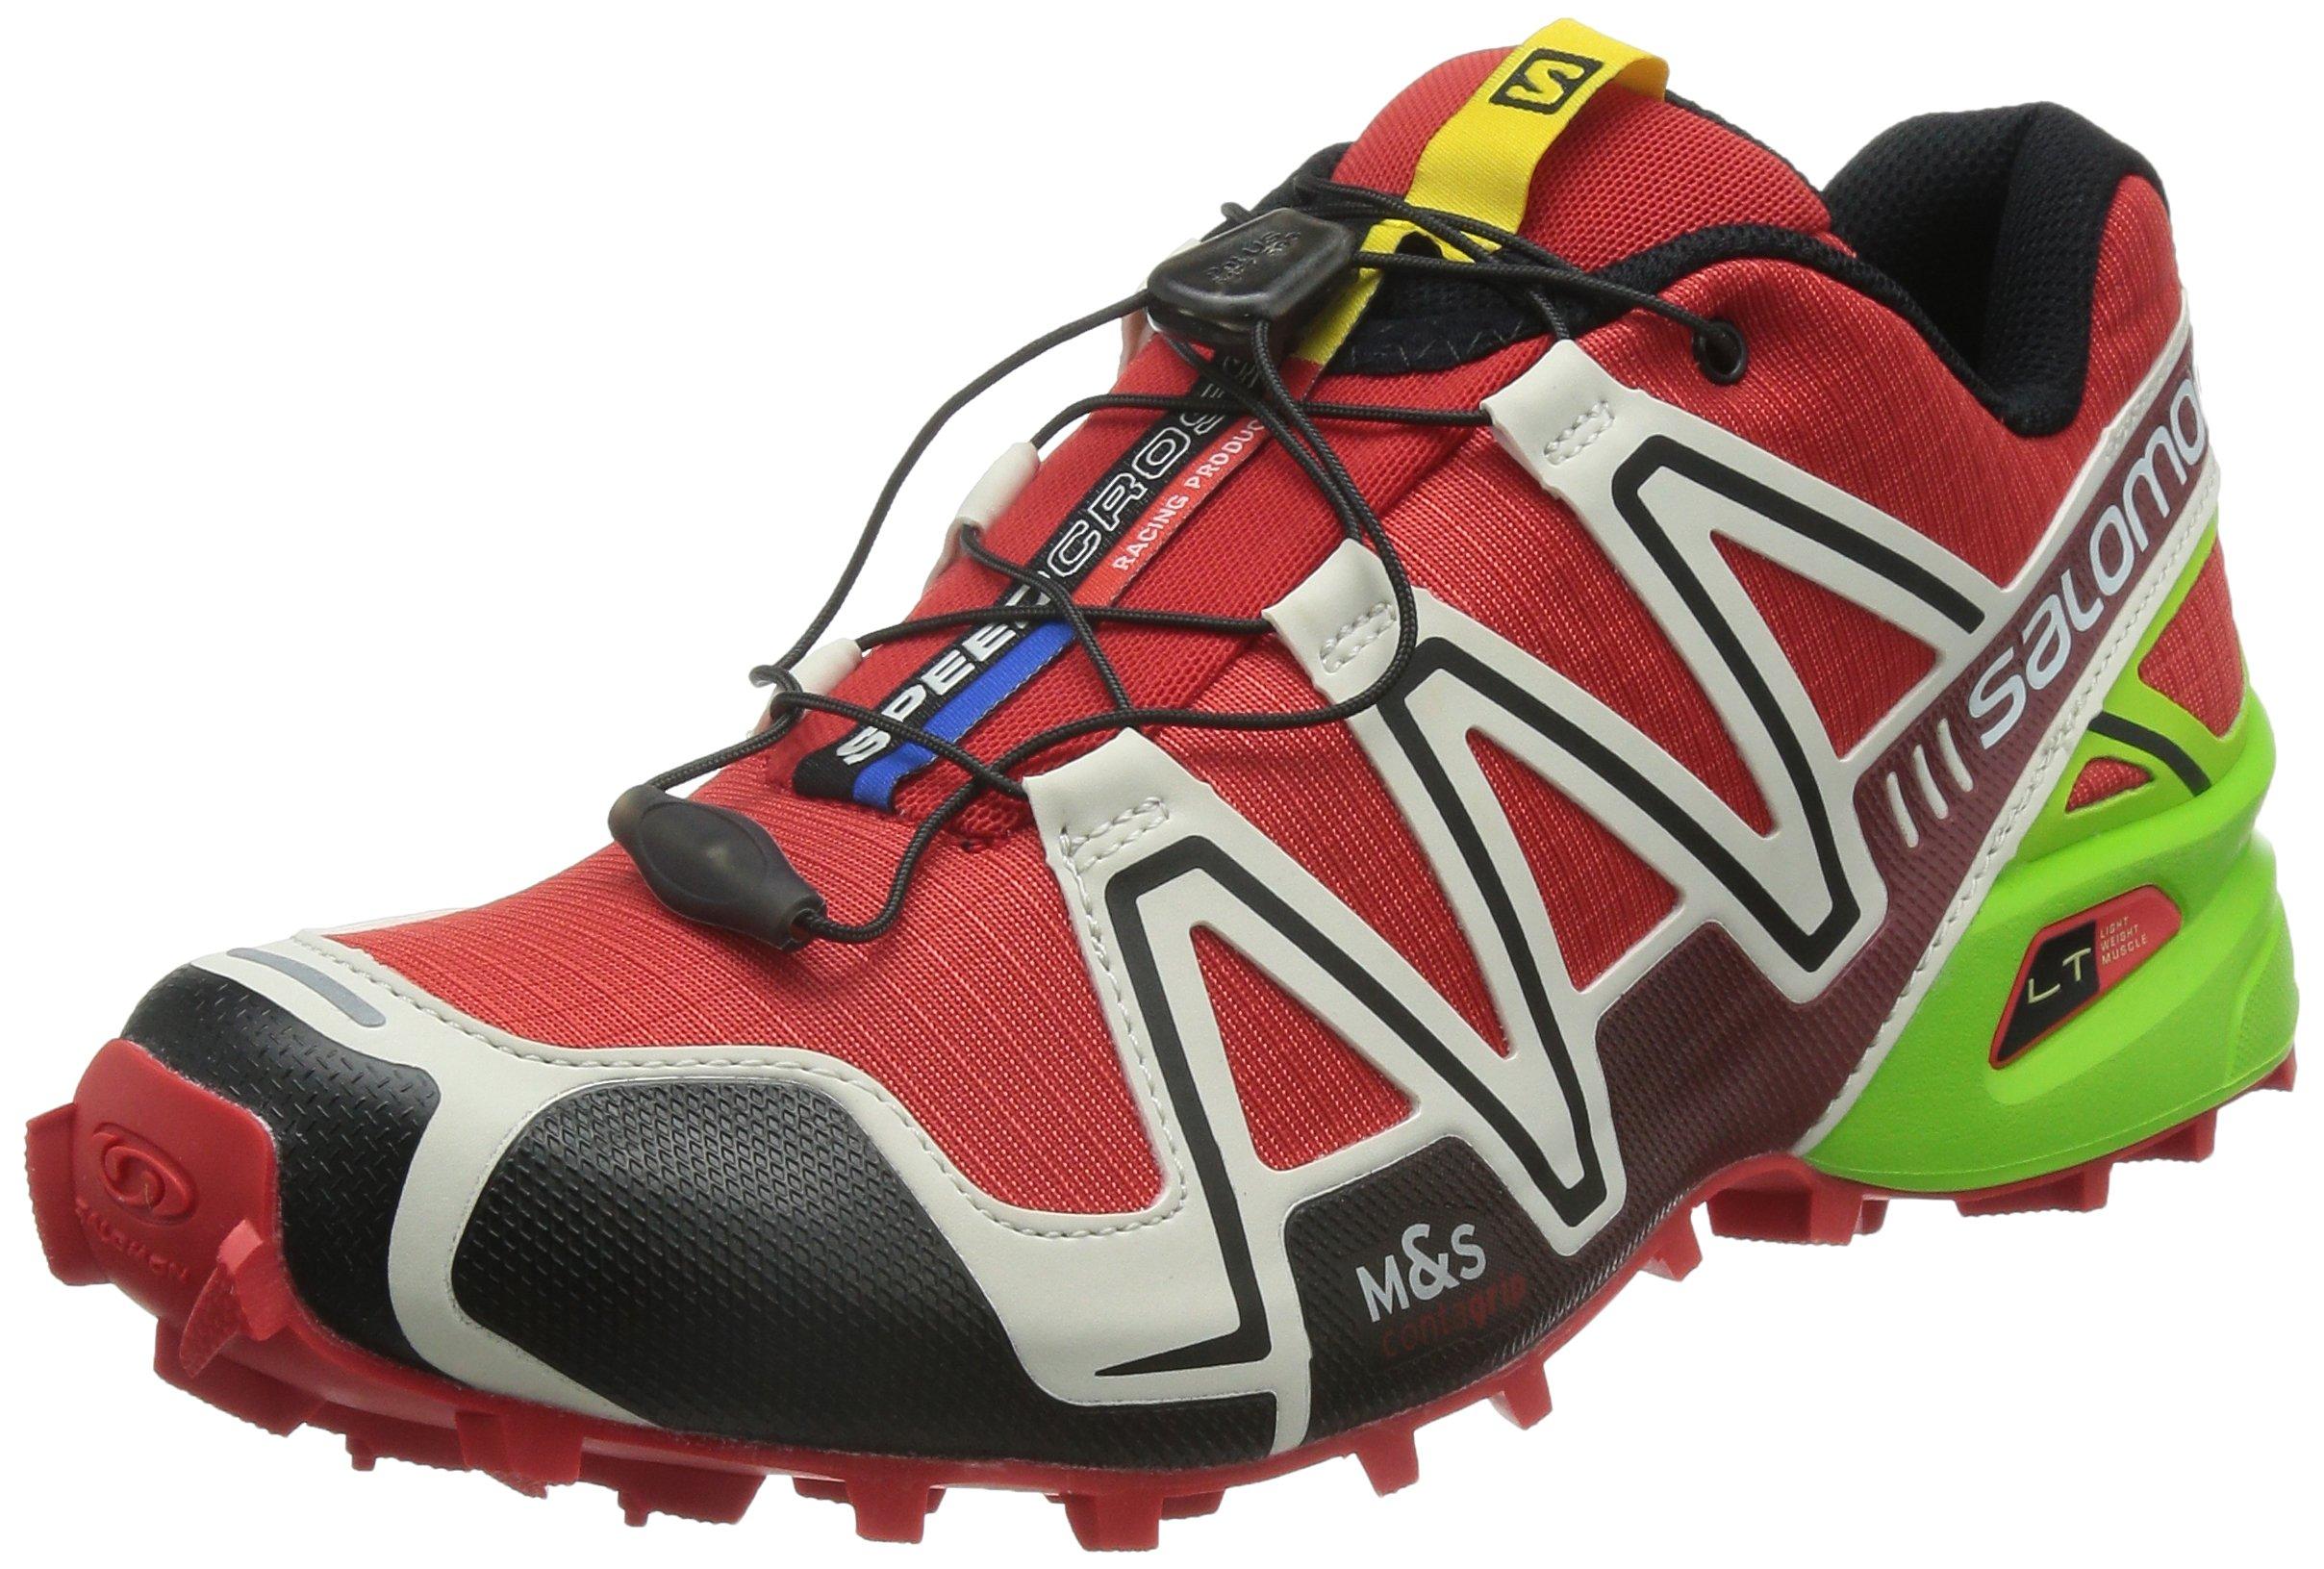 d3756ab2b9 Salomon Men s Speedcross 3 Trail Running Shoes Radiant Red Light Grey Granny  Green 10